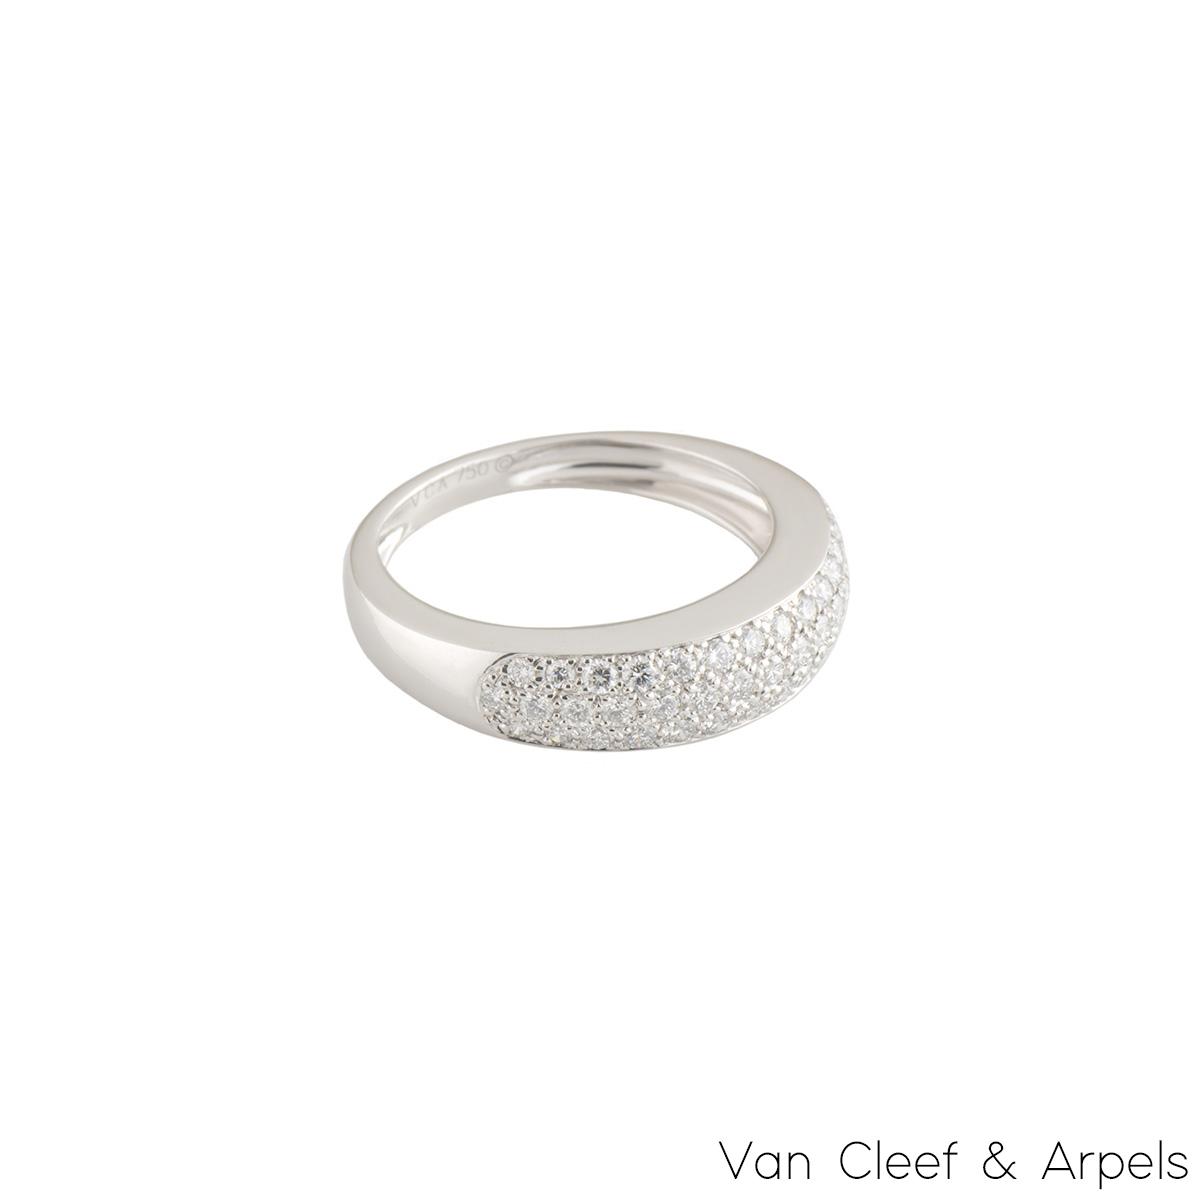 Van Cleef & Arpels White Gold Diamond Ring 0.56ct